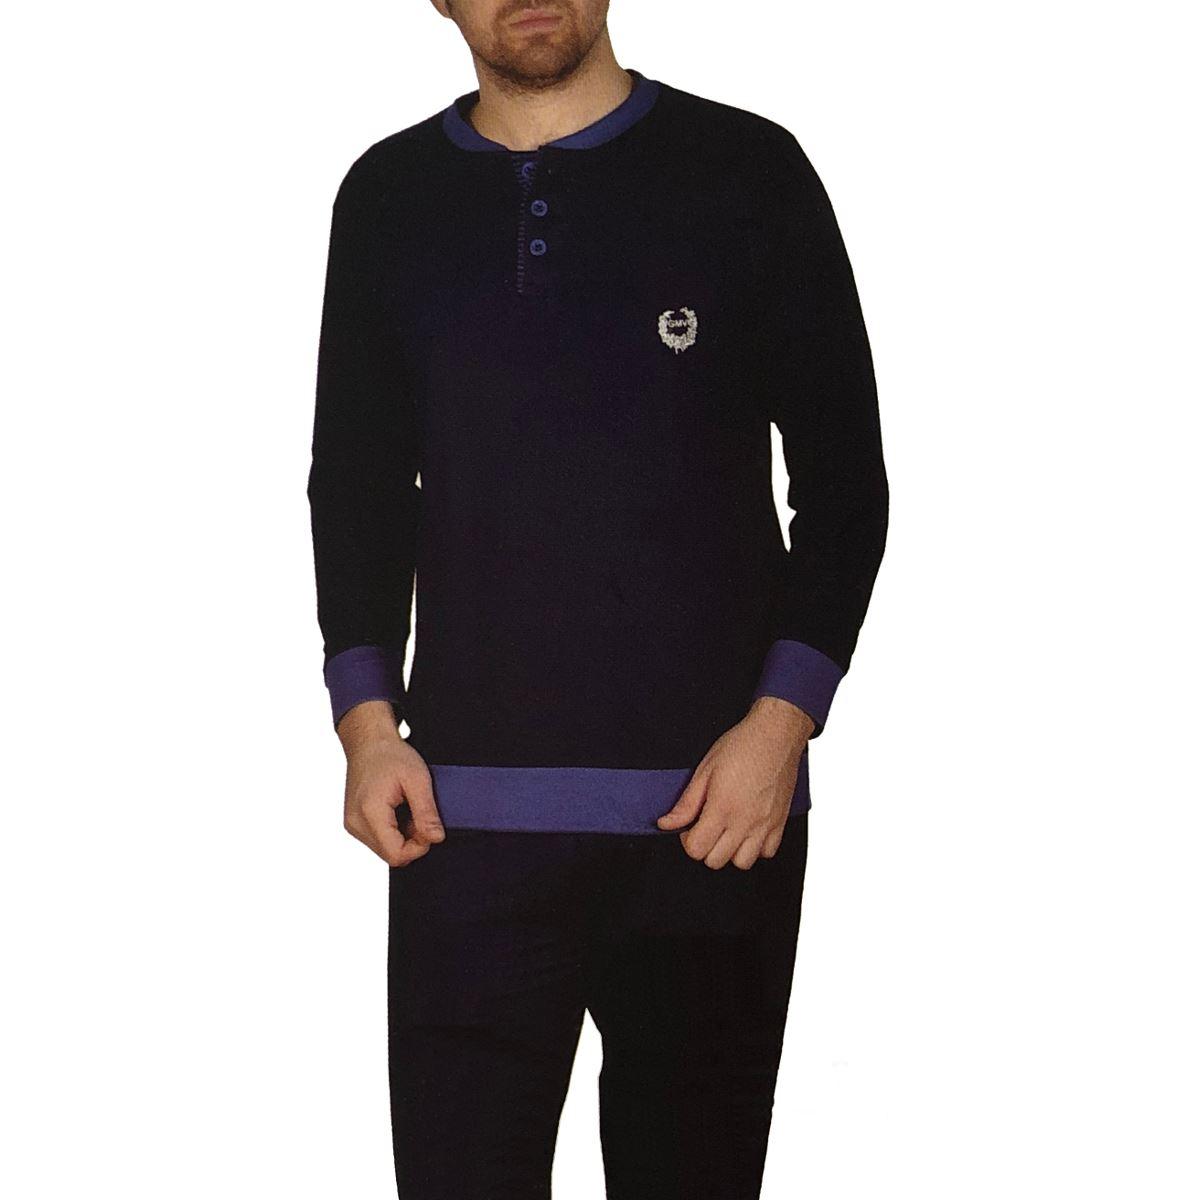 New-Mens-100-Cotton-Pyjamas-Pjs-Loungewear-Set-Nightwear-Longsleeve-Top-amp-Pant